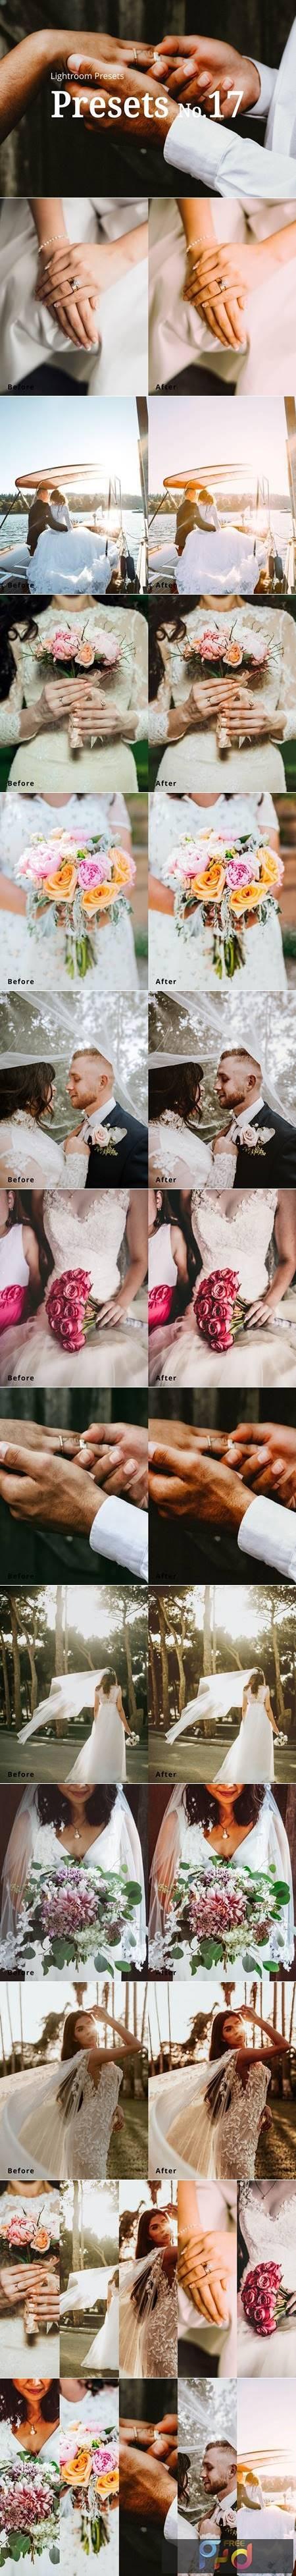 10 Wedding Lightroom Presets 5252371 1